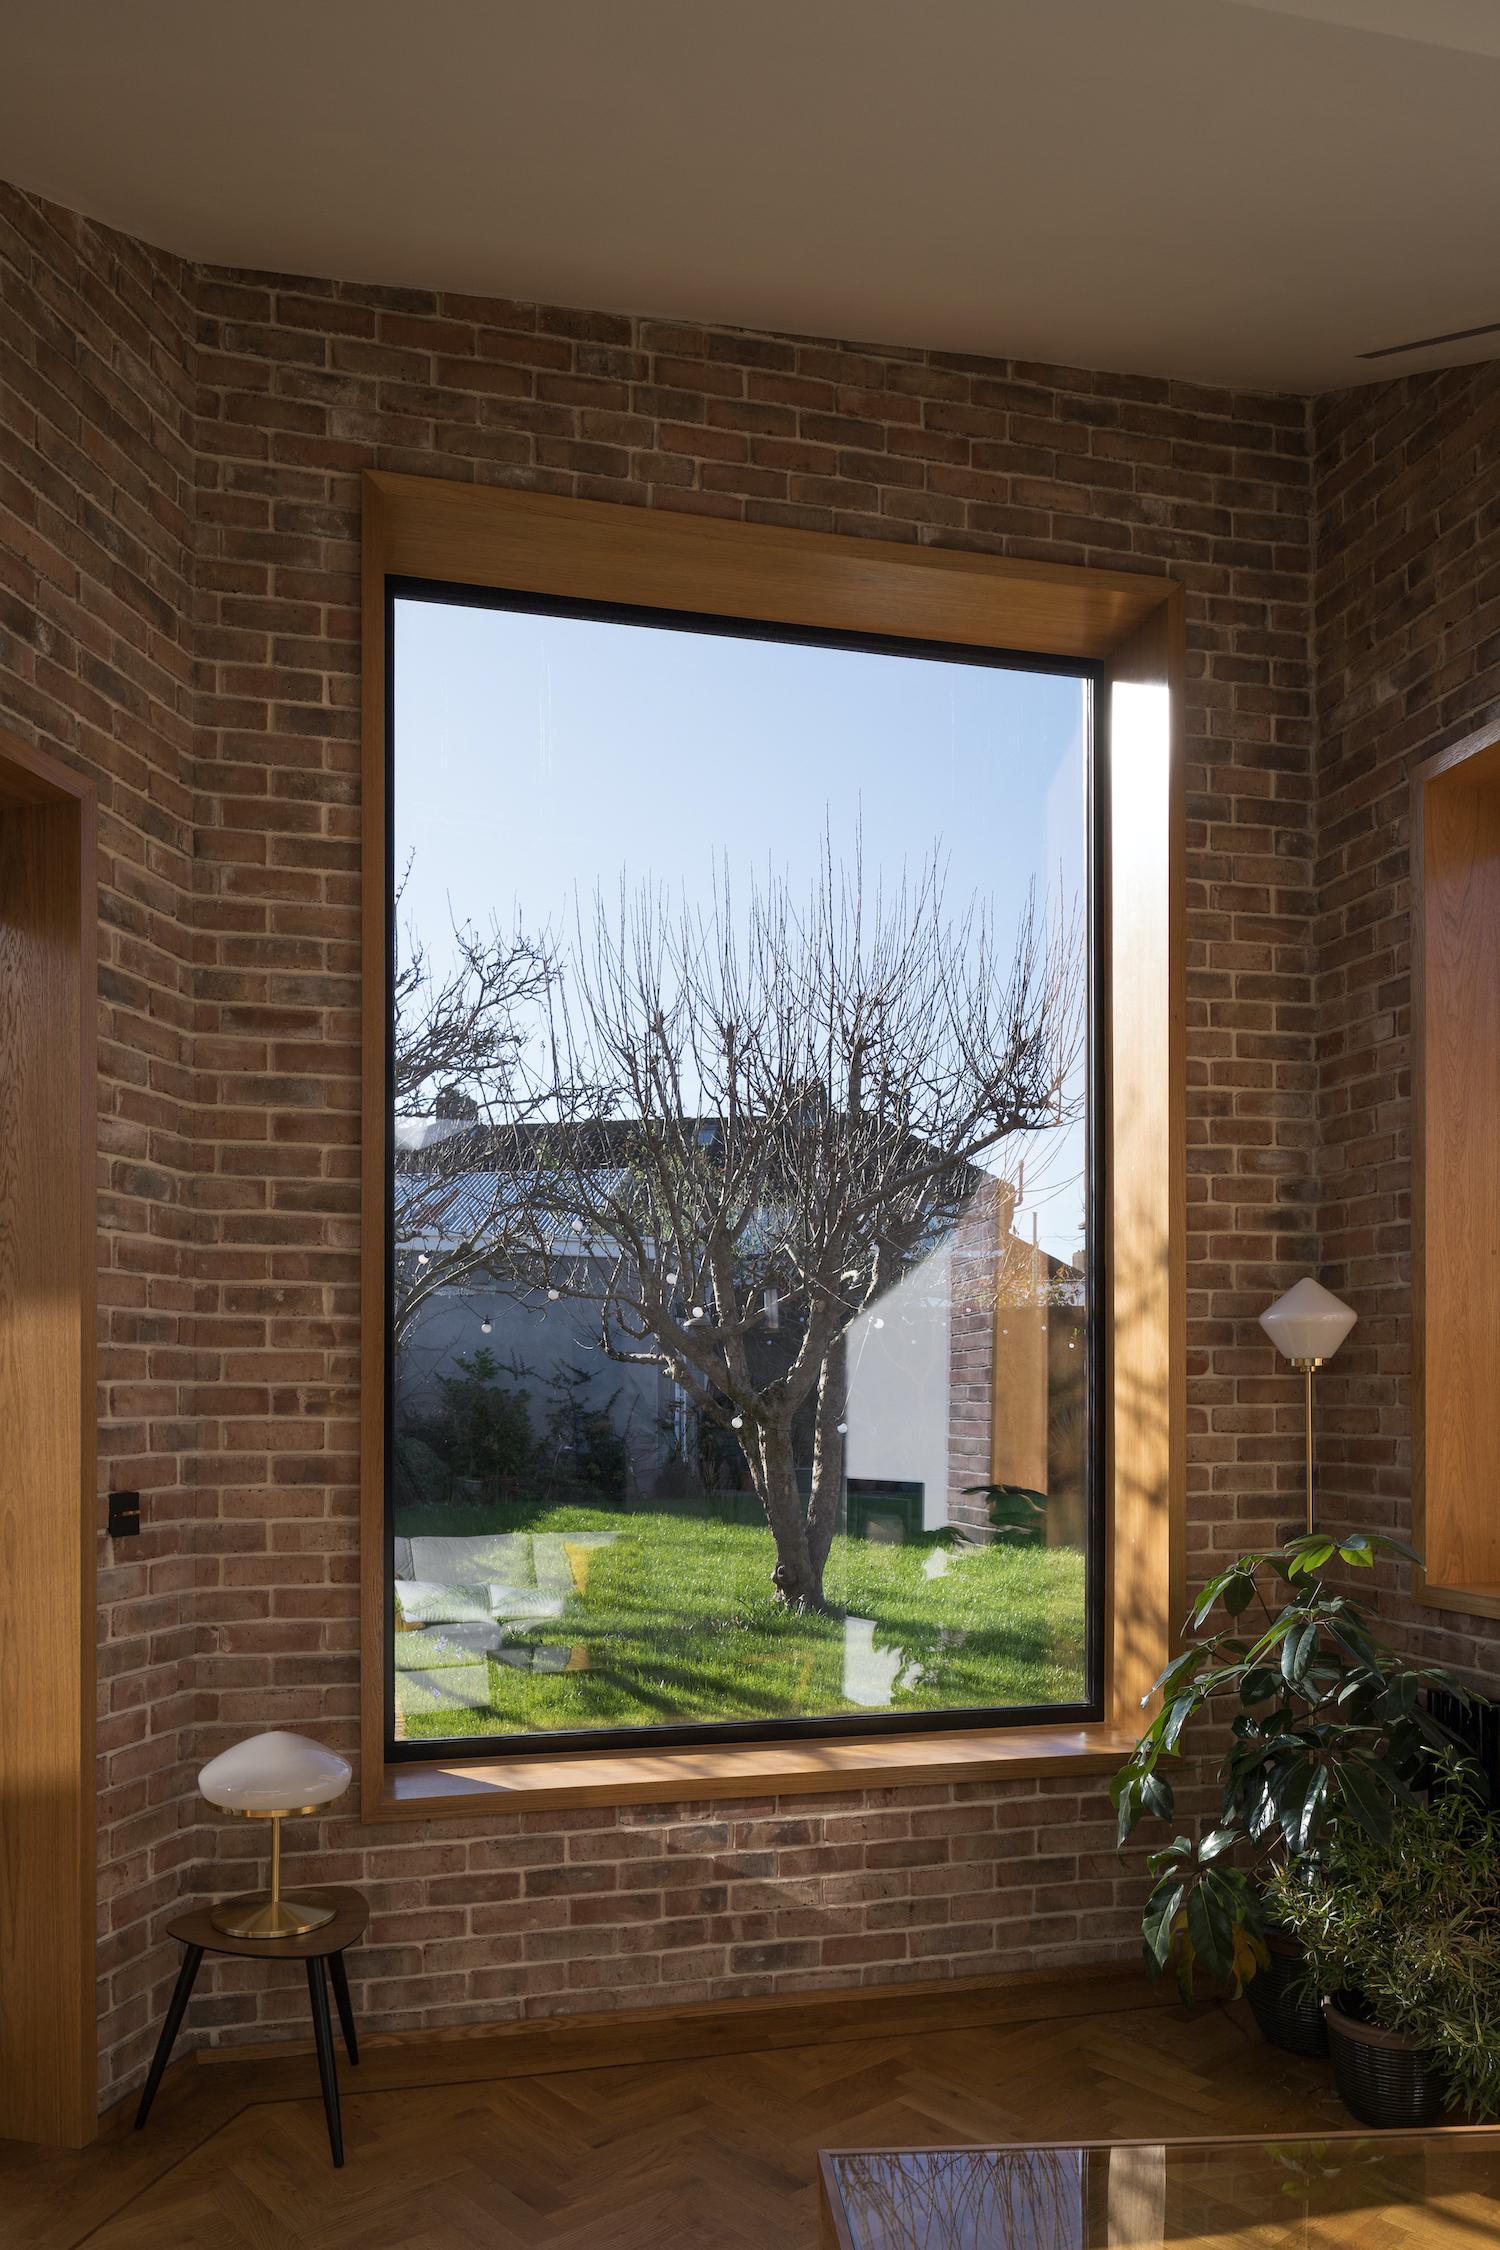 Architectural Farm_Garden Room (2) Andrew Campion